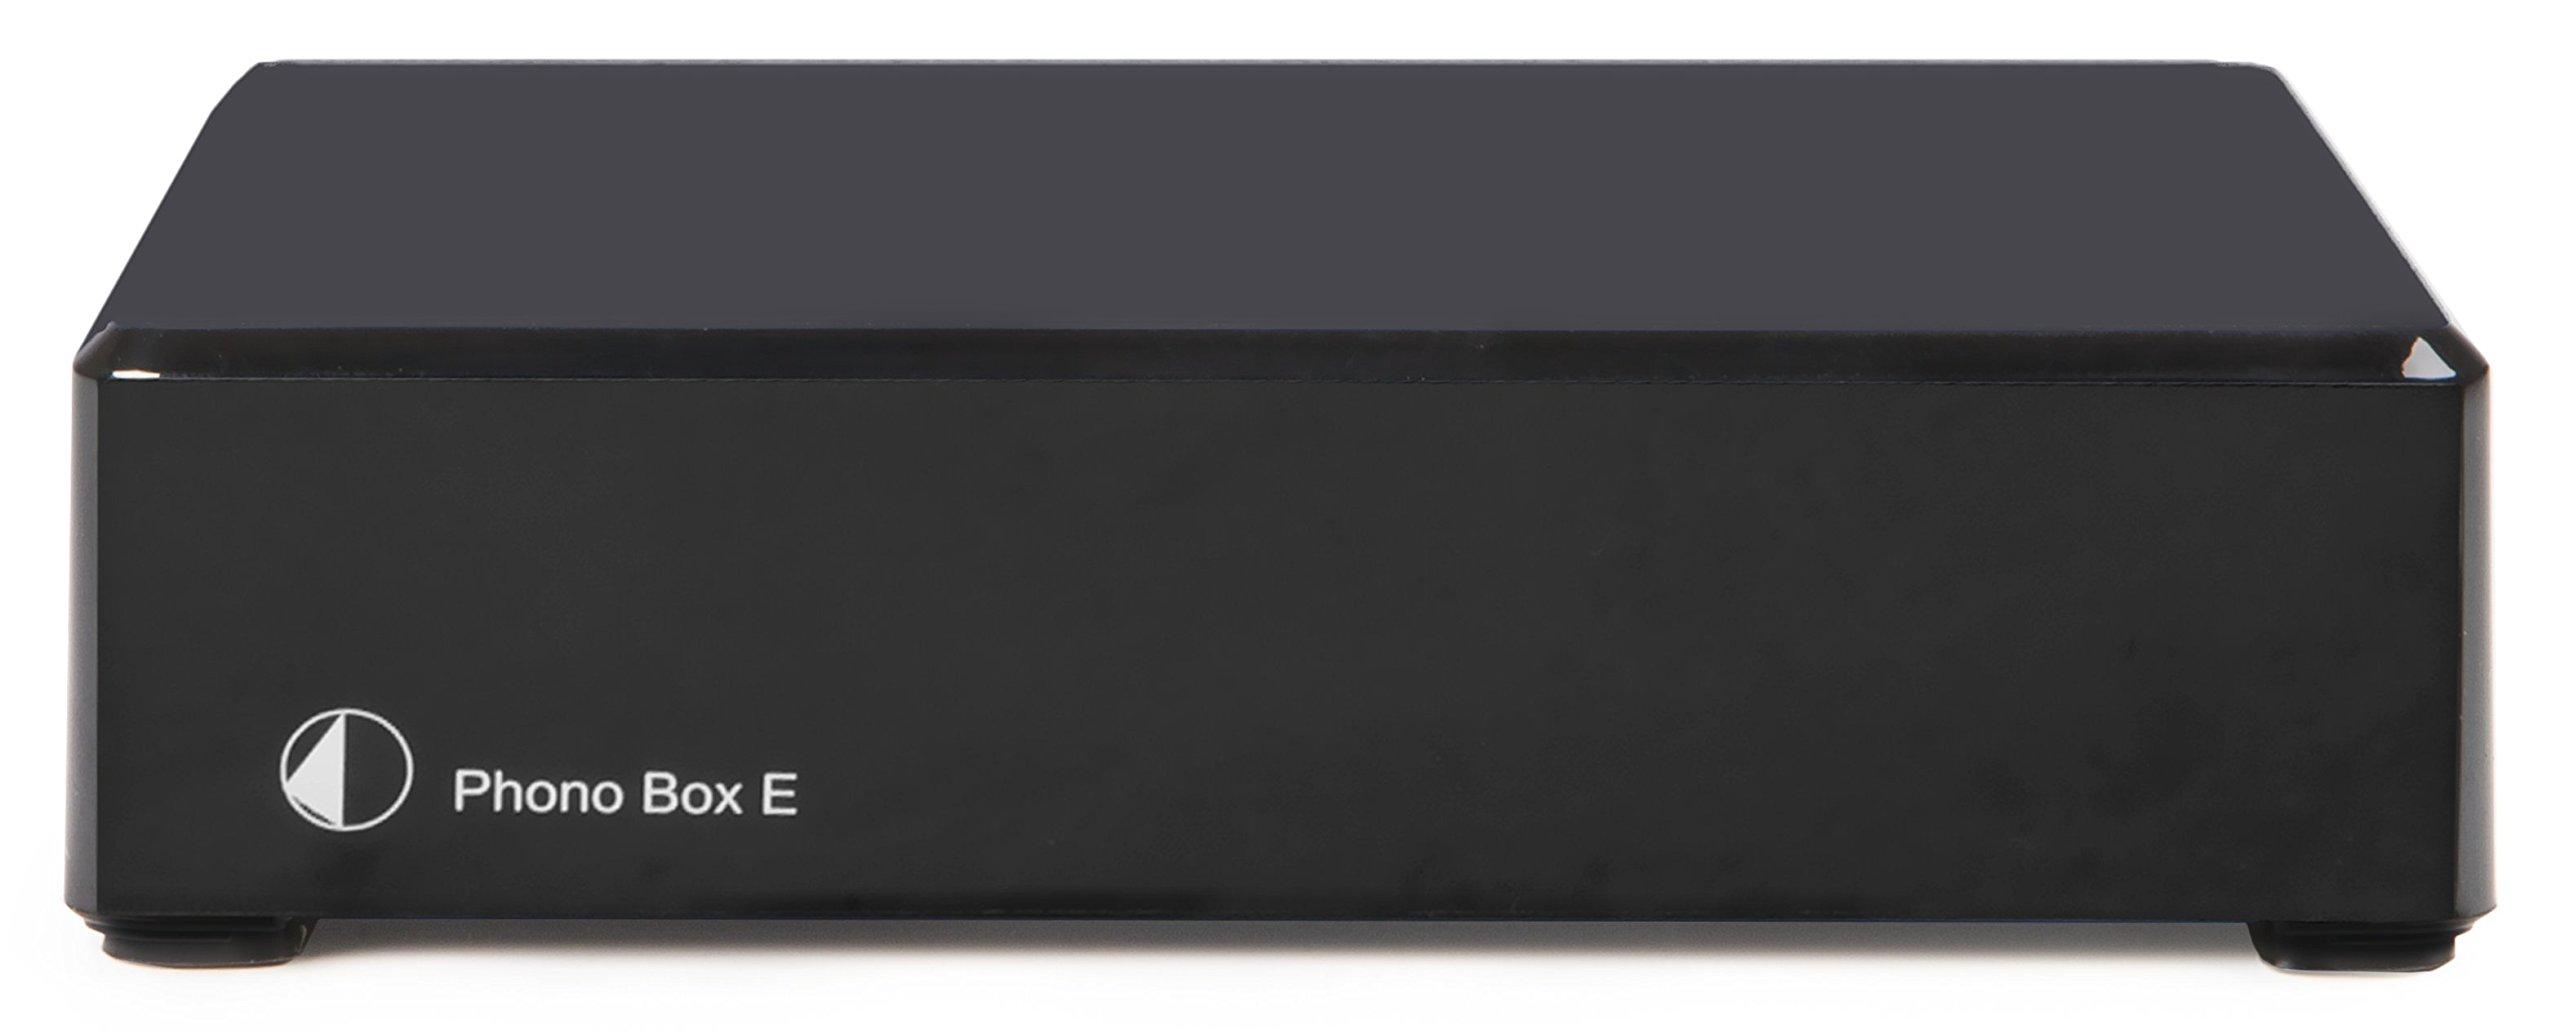 Pro-Ject Phono Box E Phonograph Preamplifier Black